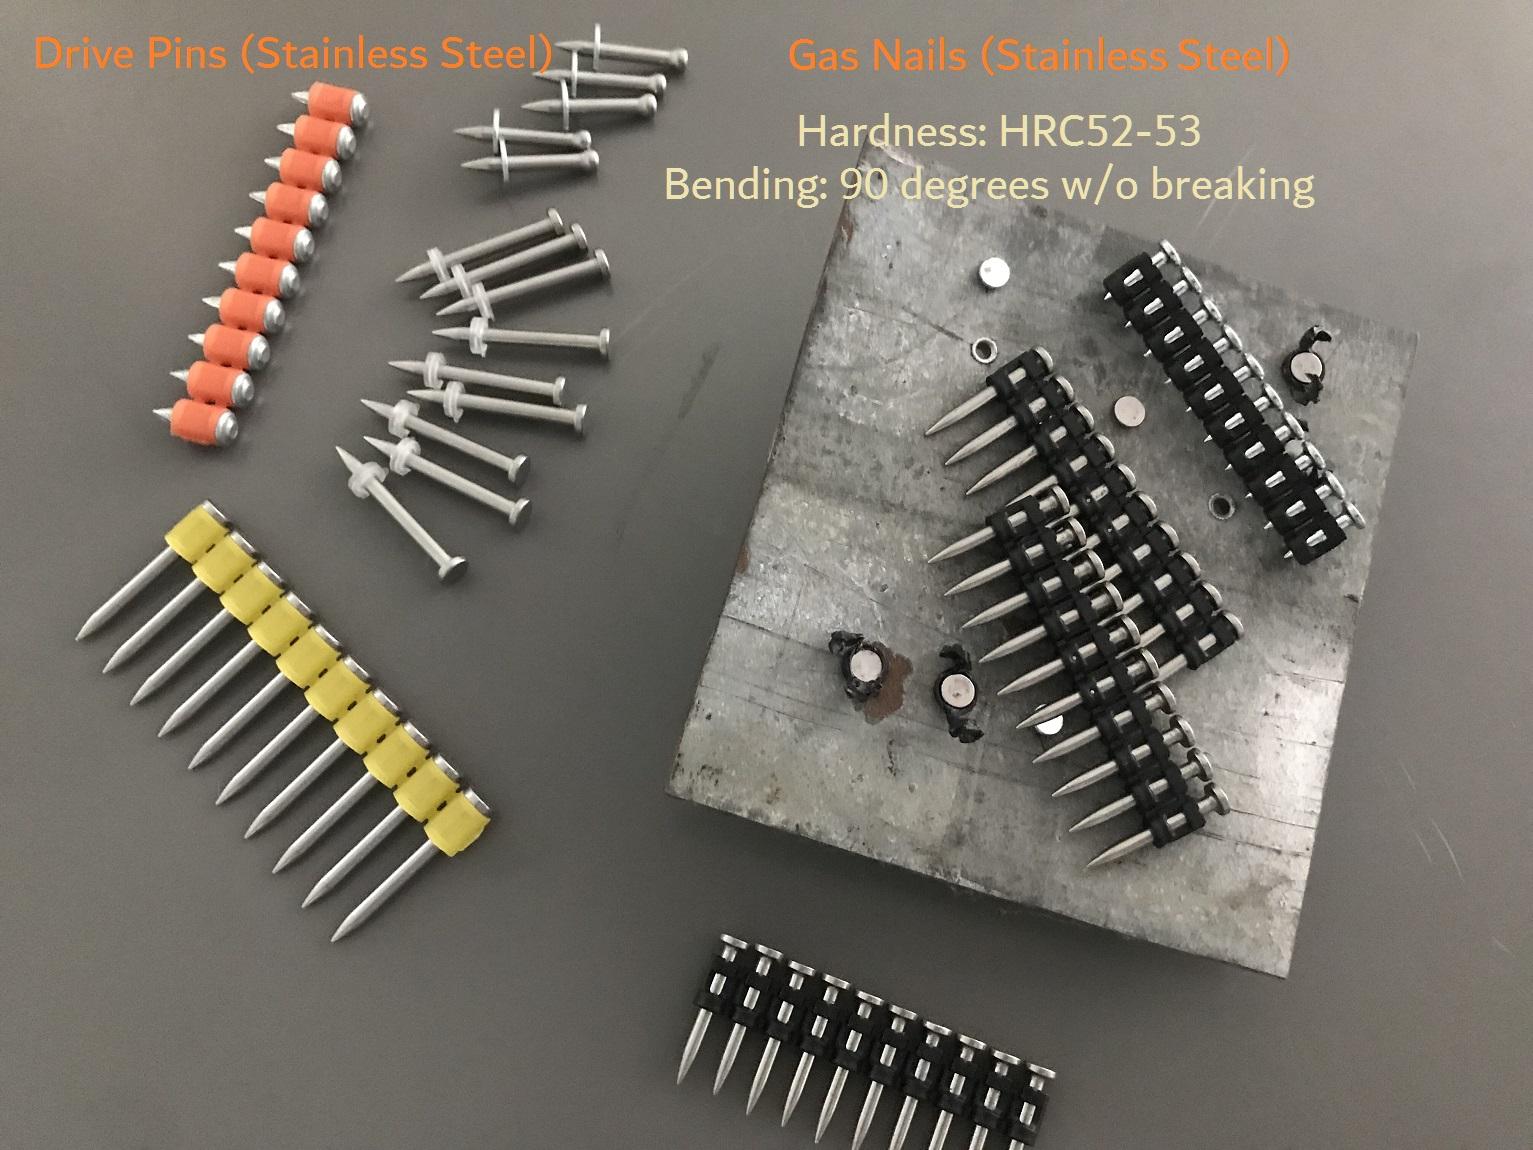 proimages/SS_Drive_pins__Gas_Nails.jpg